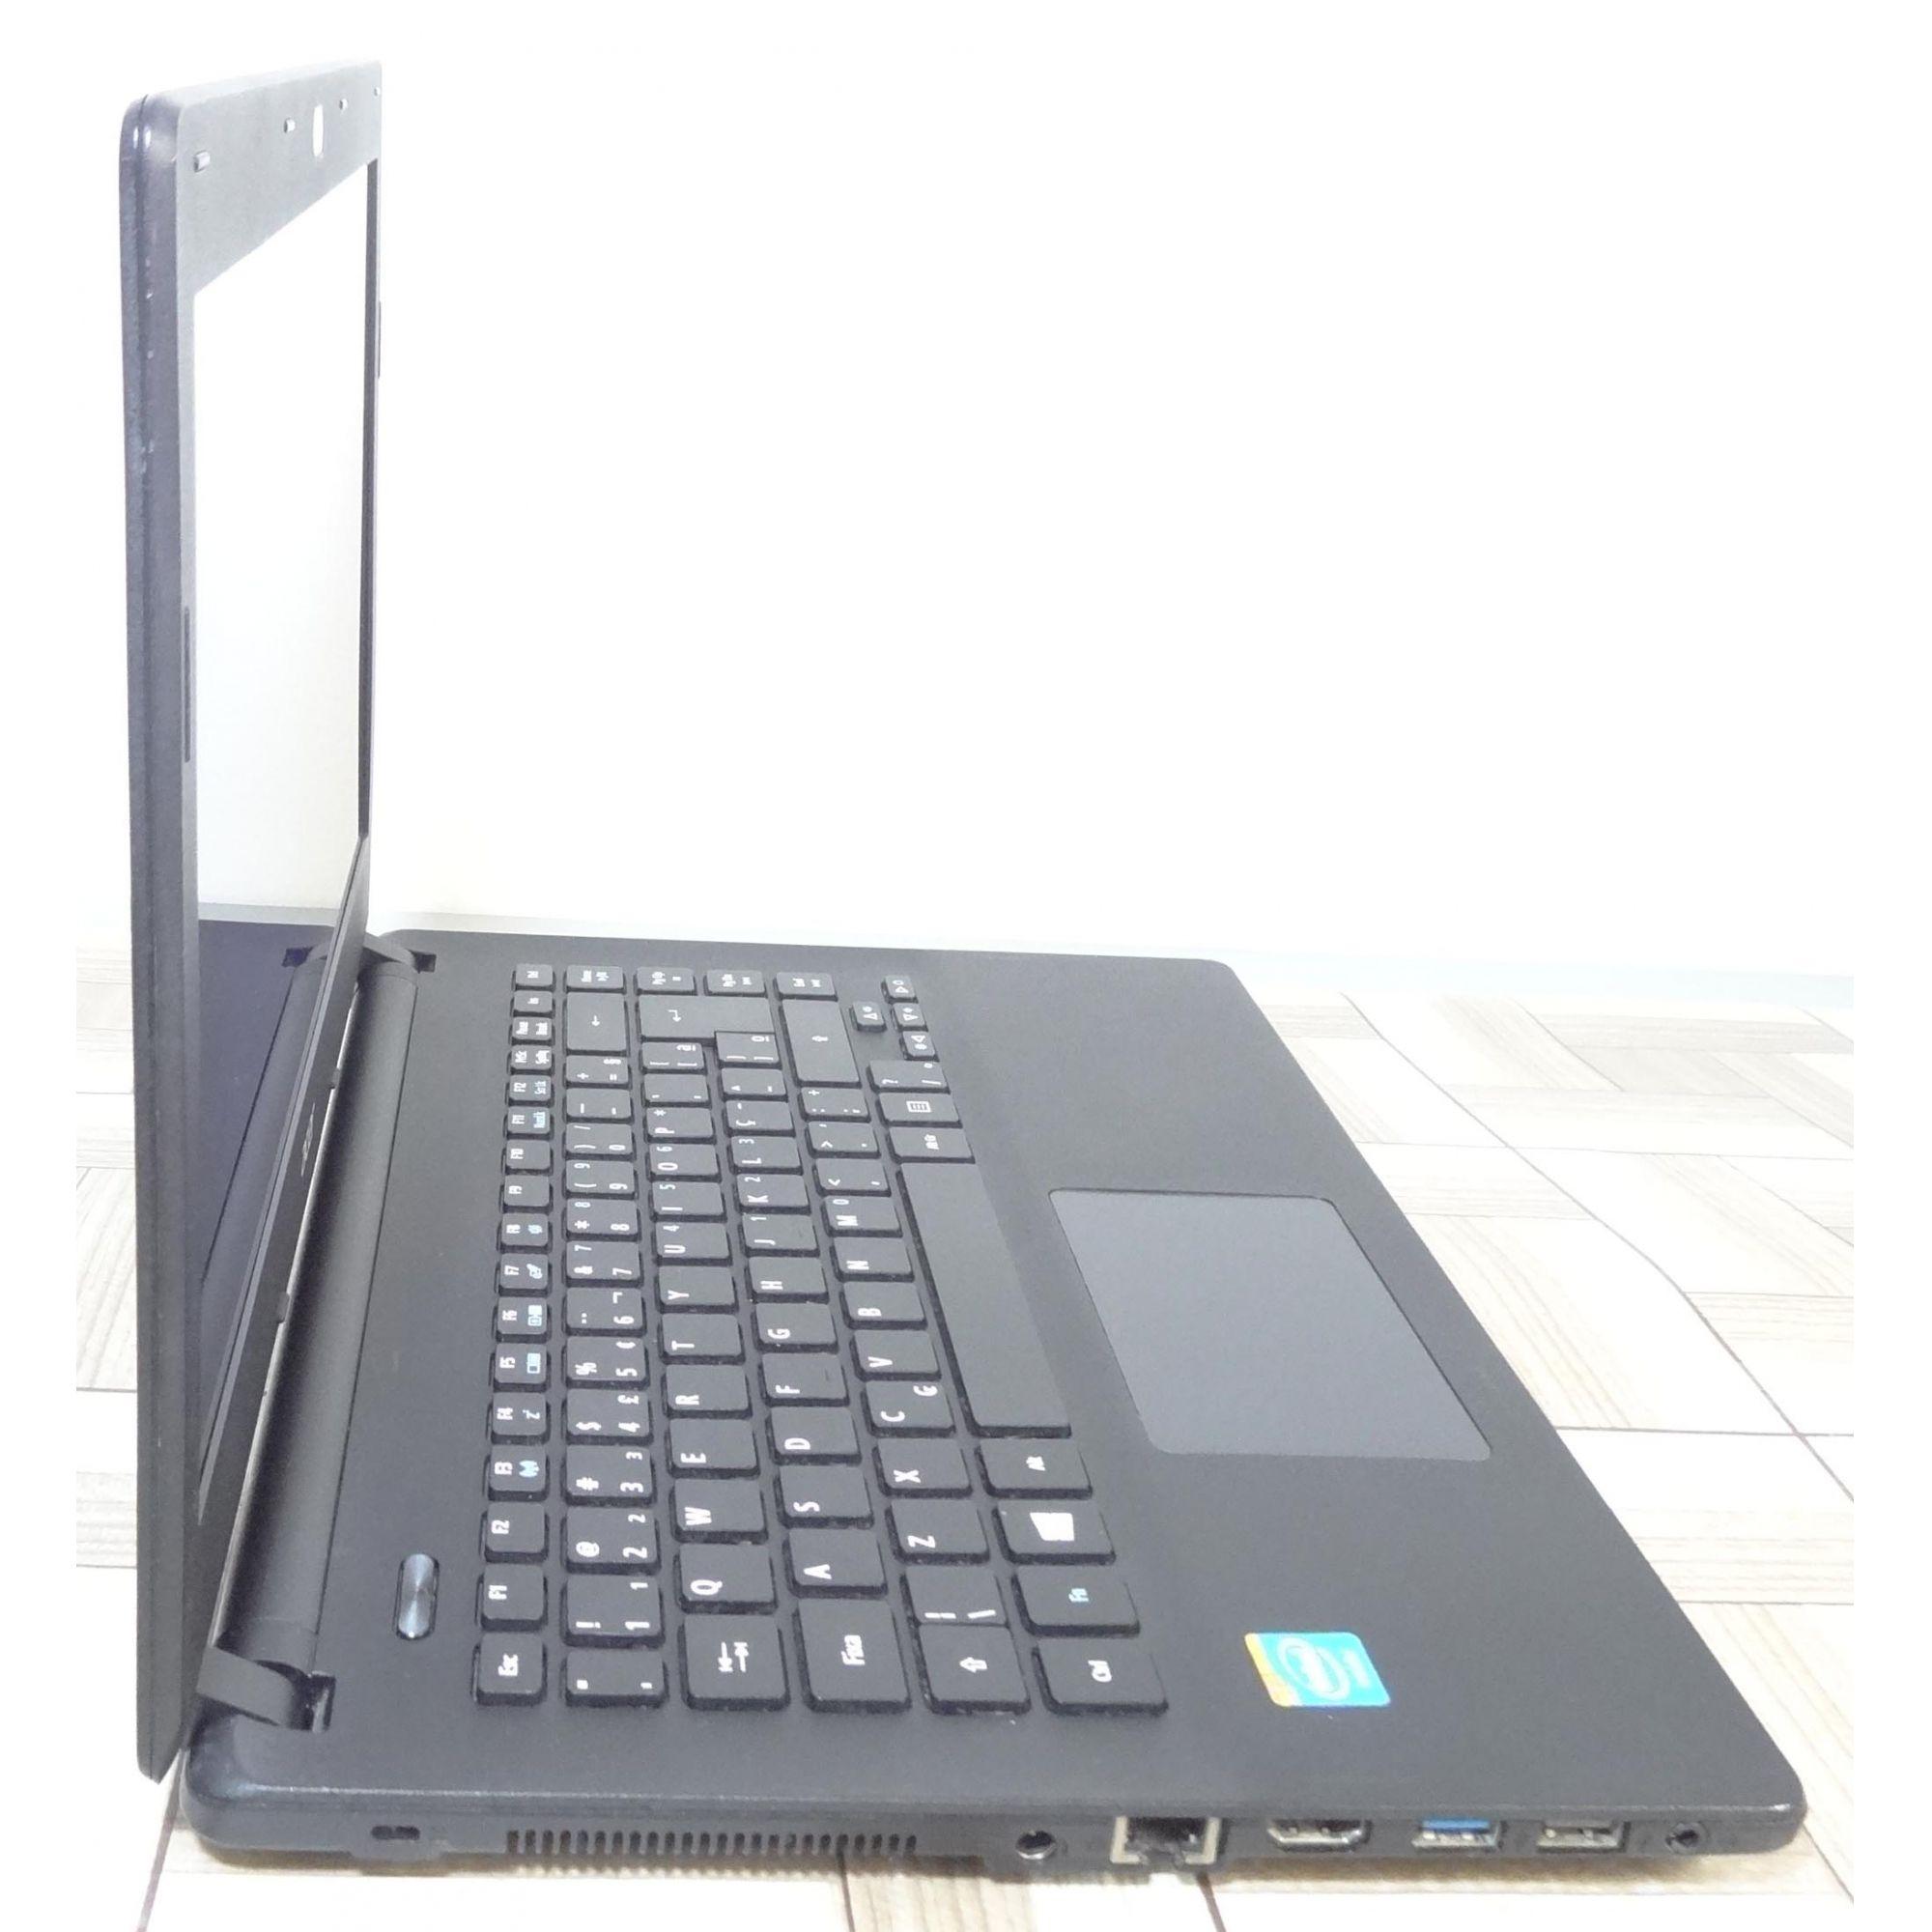 Notebook Acer Aspire ES1-411 14'' Celeron 1.83GHz 4GB HD-500GB